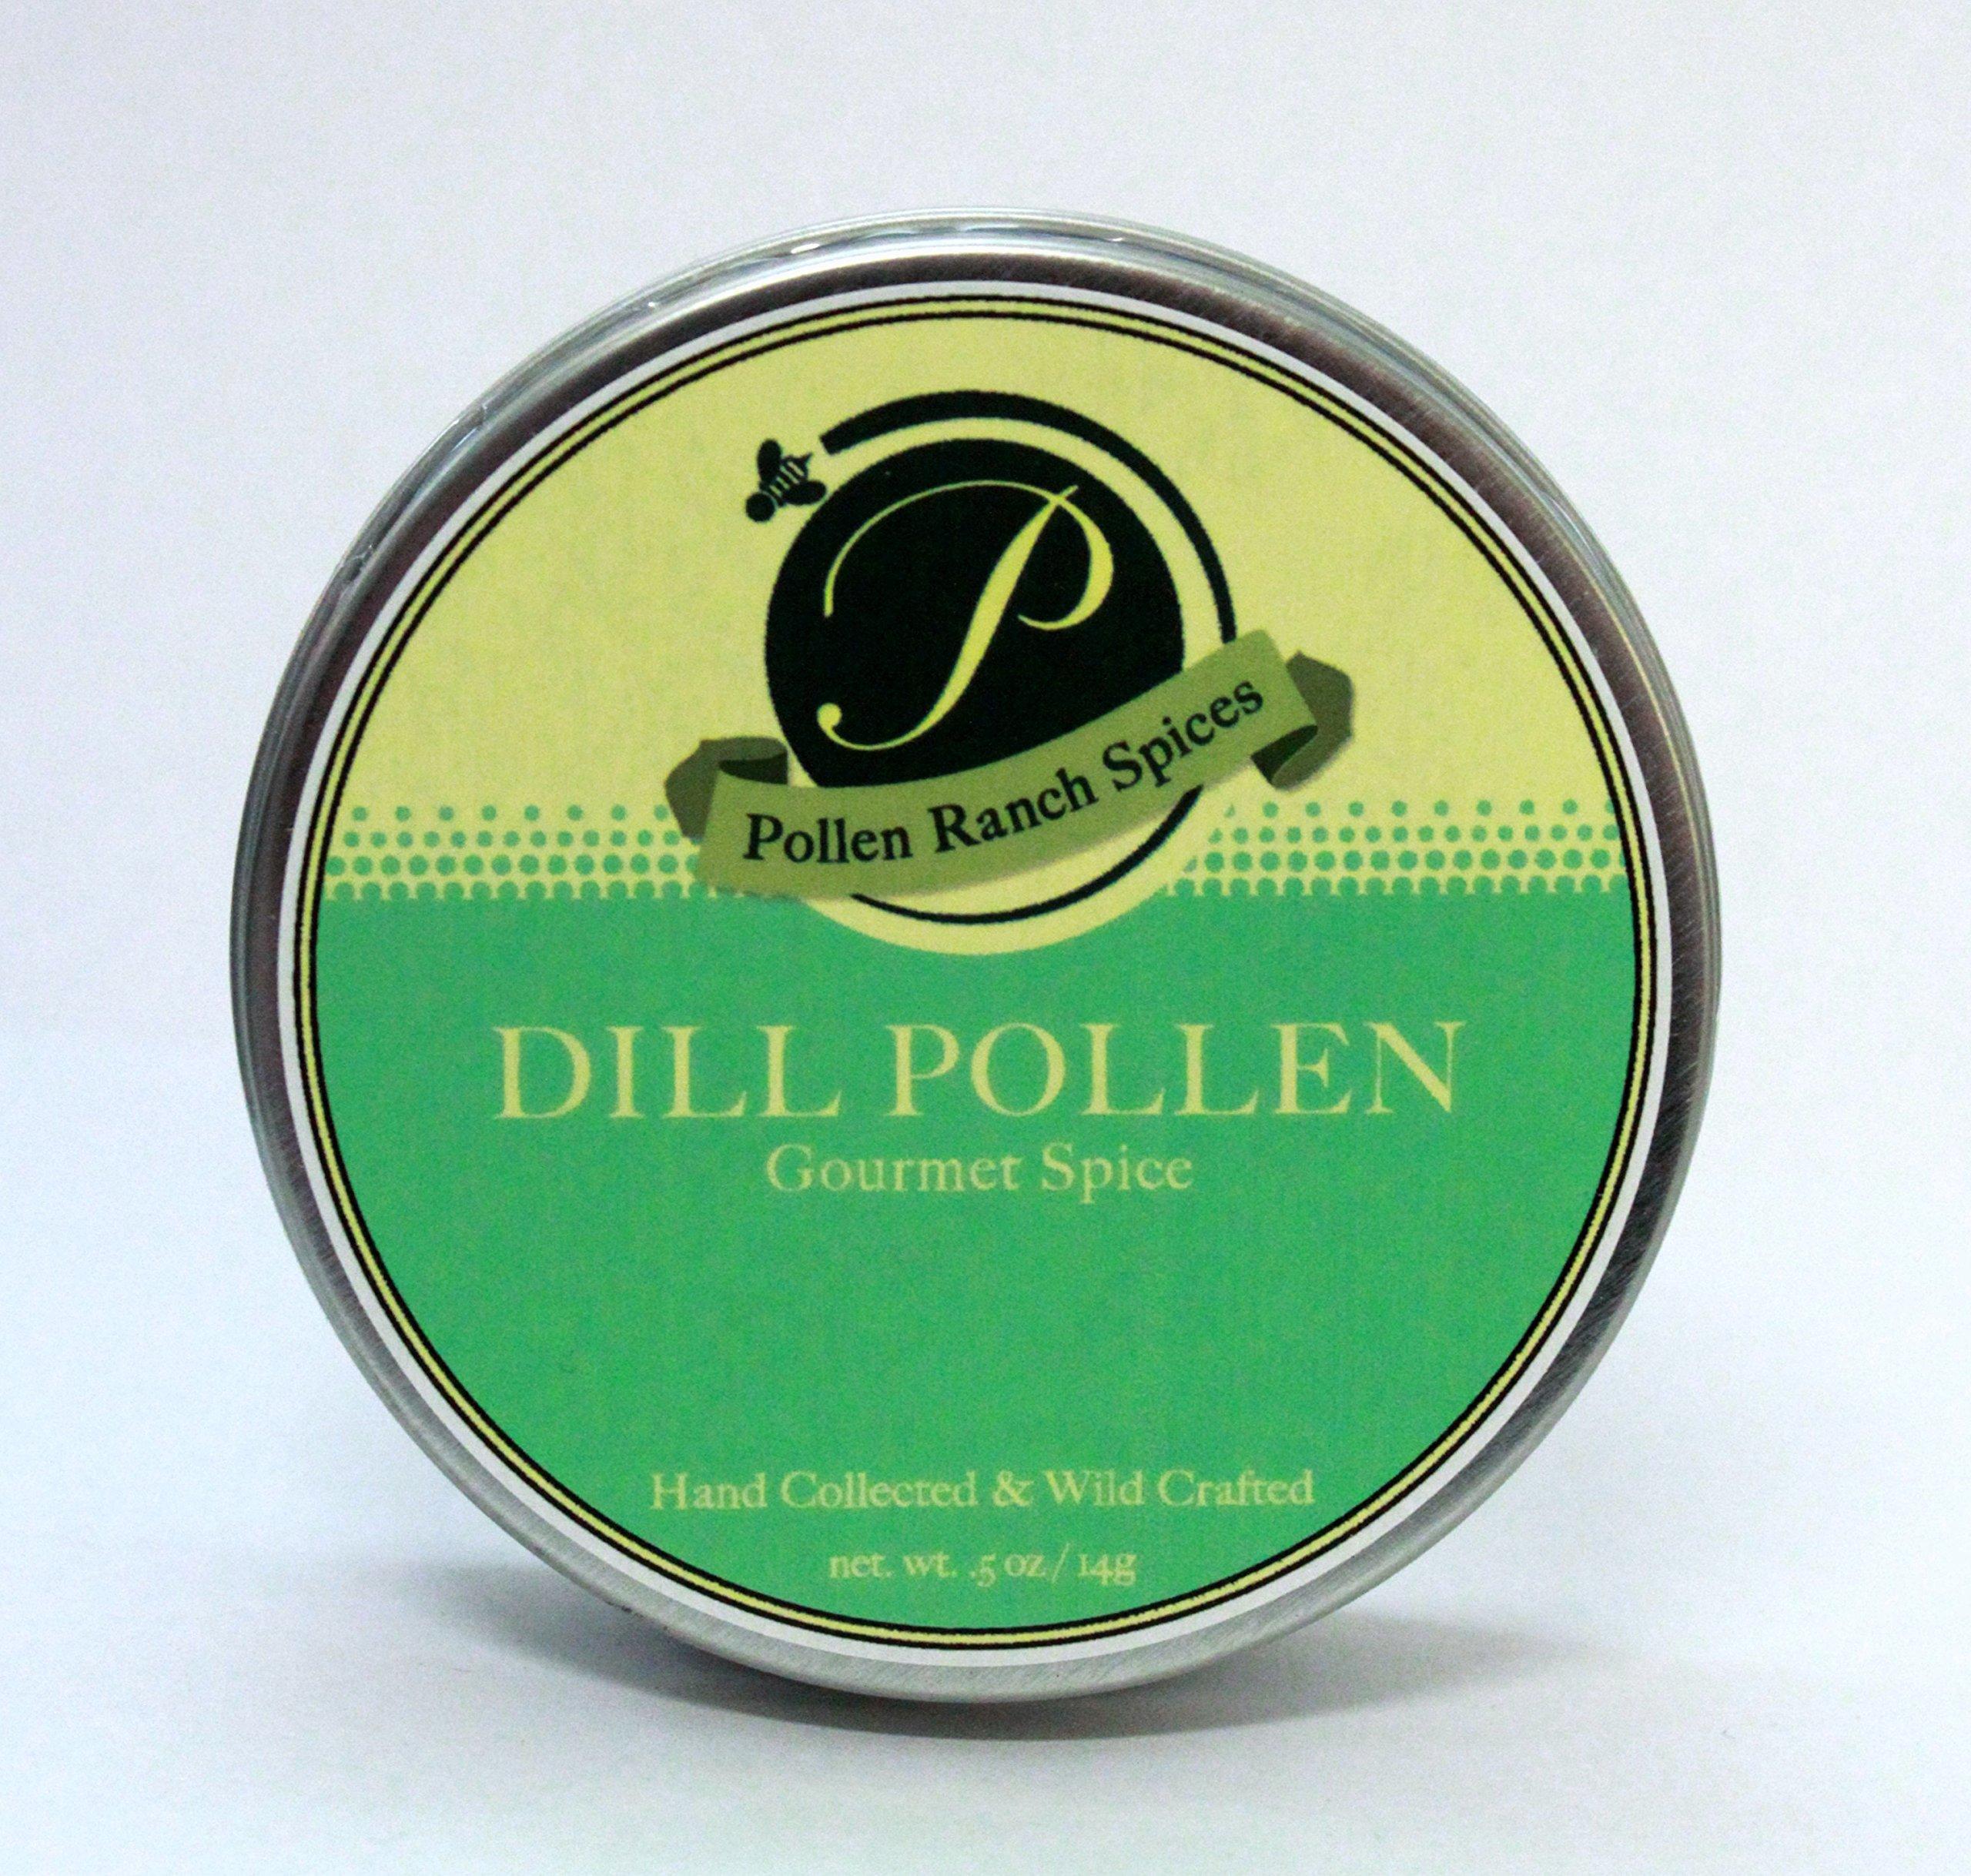 Dill Pollen (0.5 oz.)